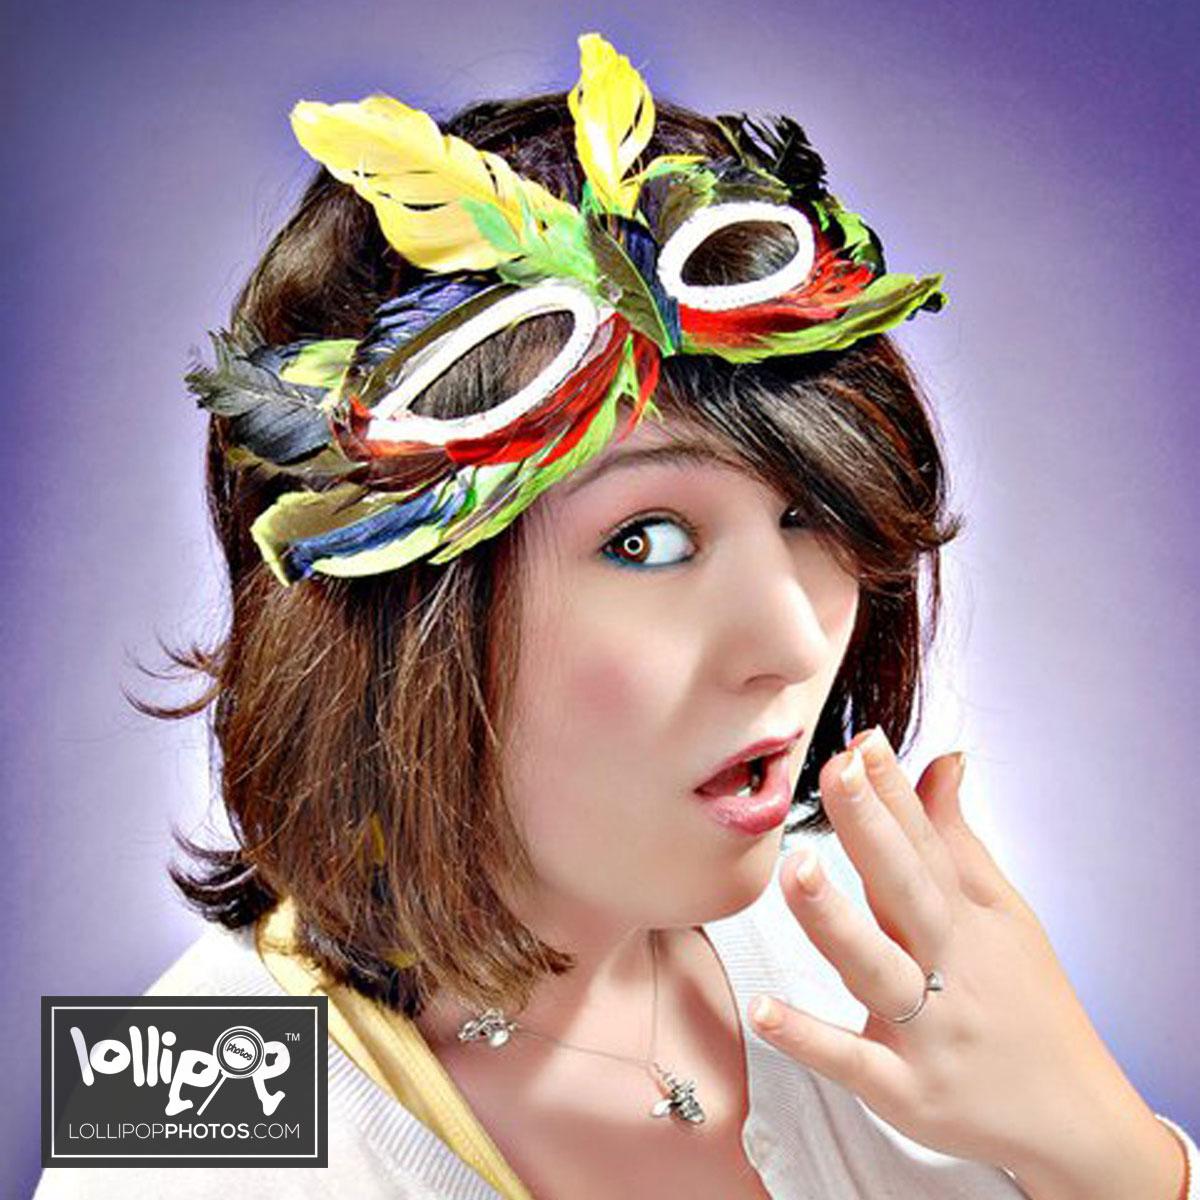 msdig-nora-canfield-lollipop-photos-523.jpg